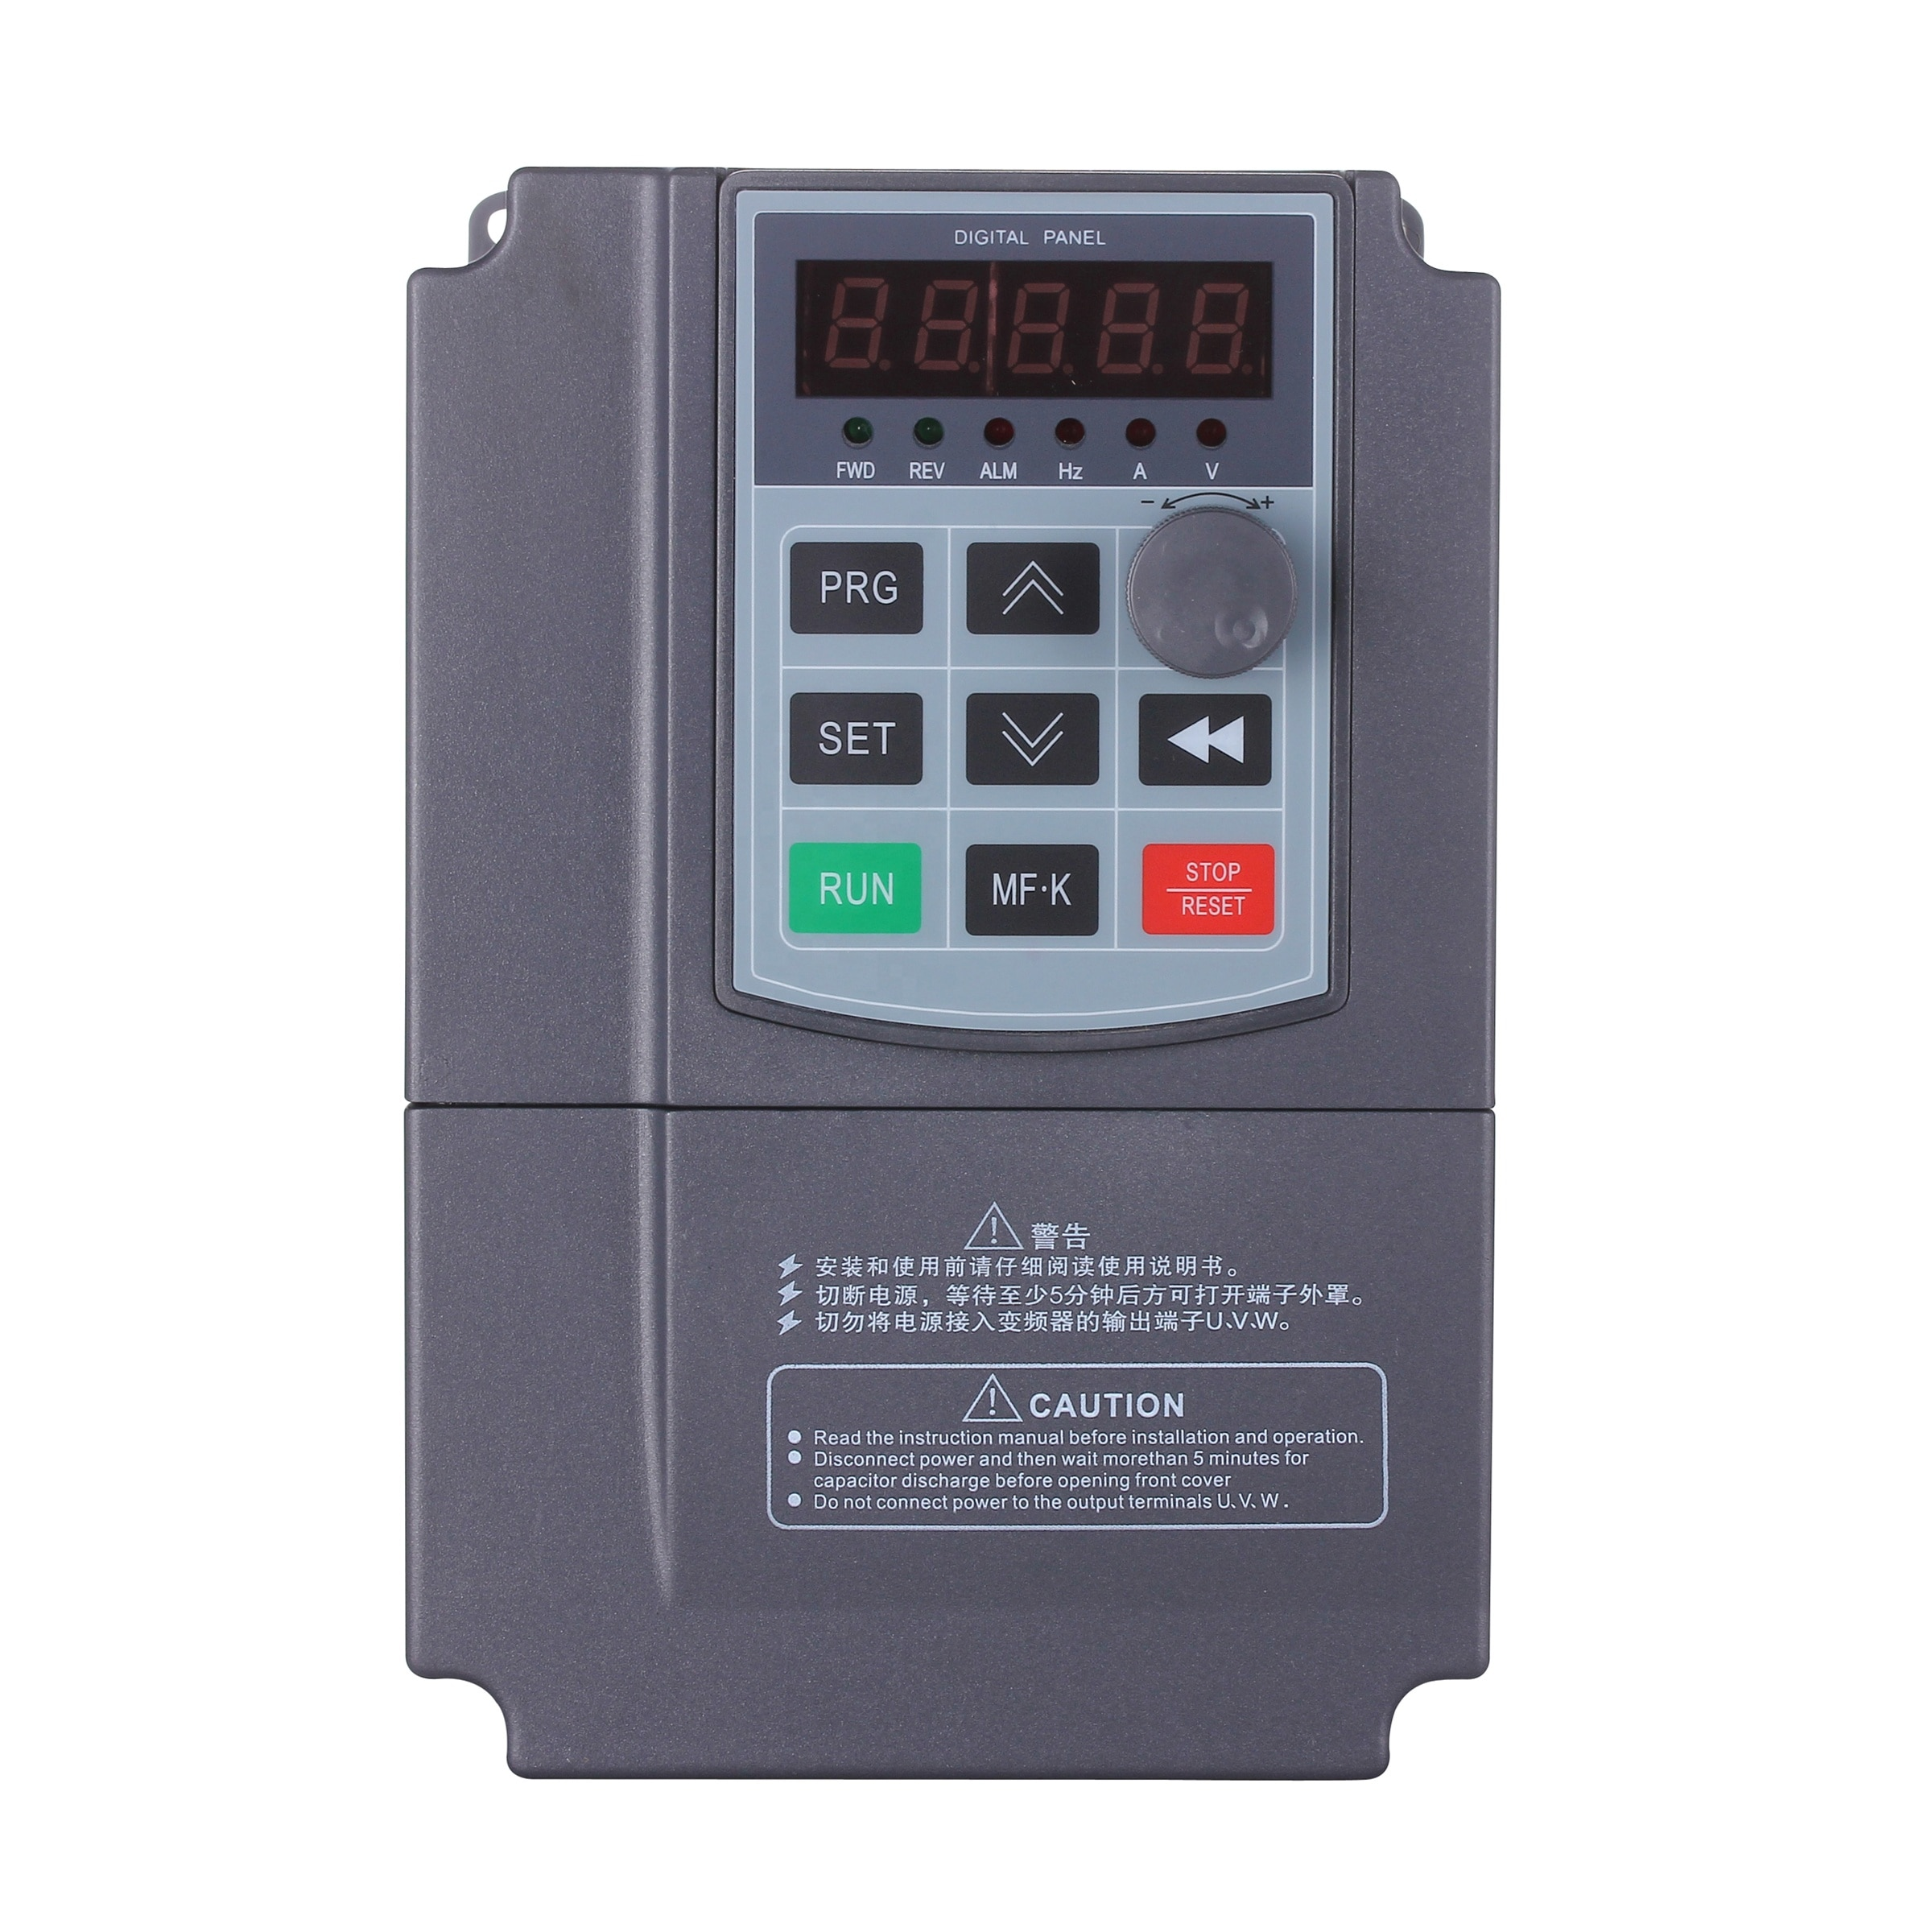 MPPT 2.2kw 3hp 220 فولت محول ومضخة شمسية وحدة تحكم التيار المتناوب بسعر المصنع